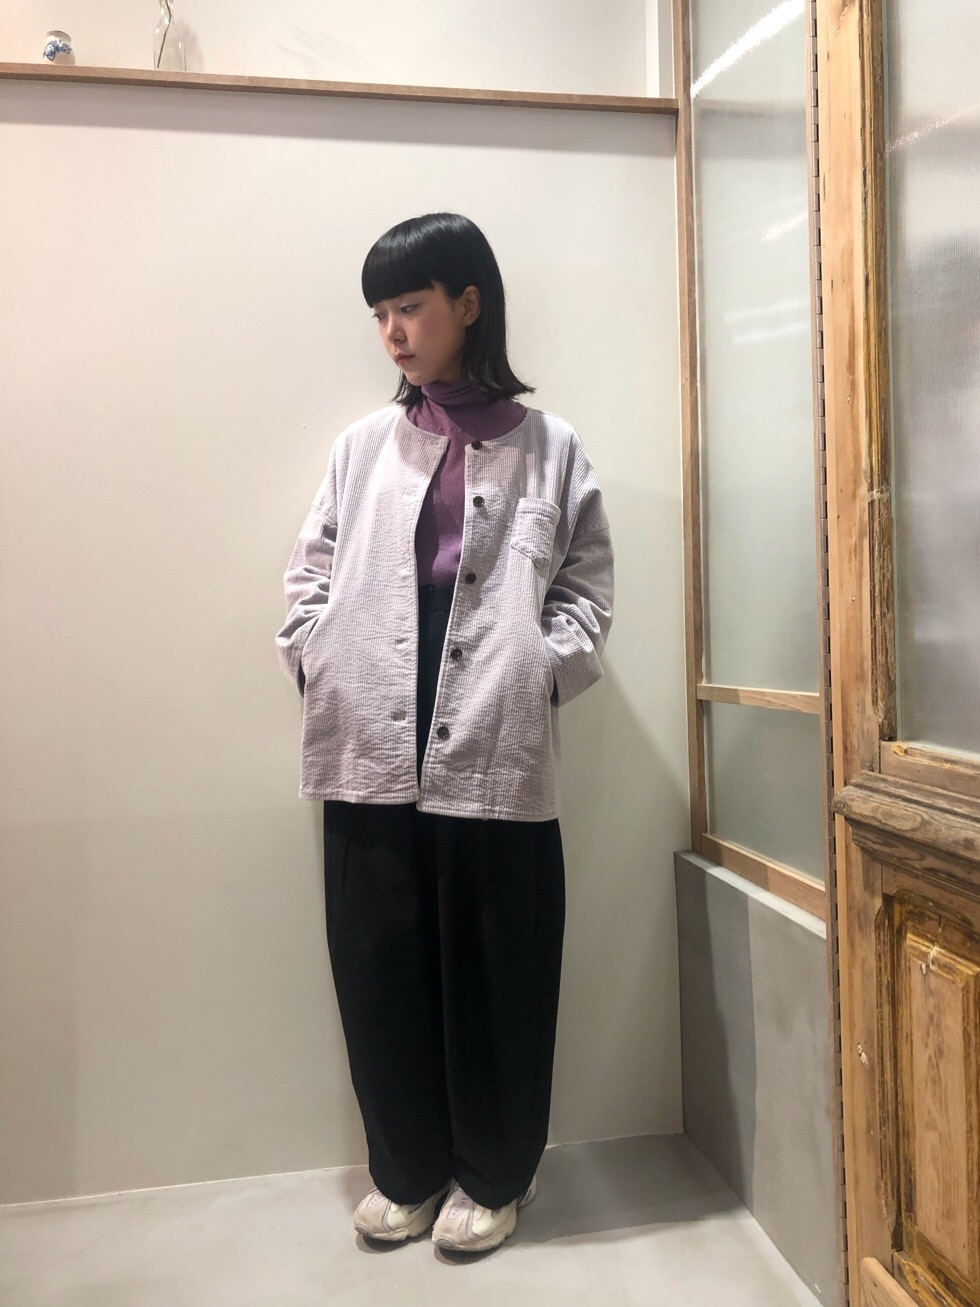 bulle de savon 渋谷スクランブルスクエア 身長:153cm 2019.11.16